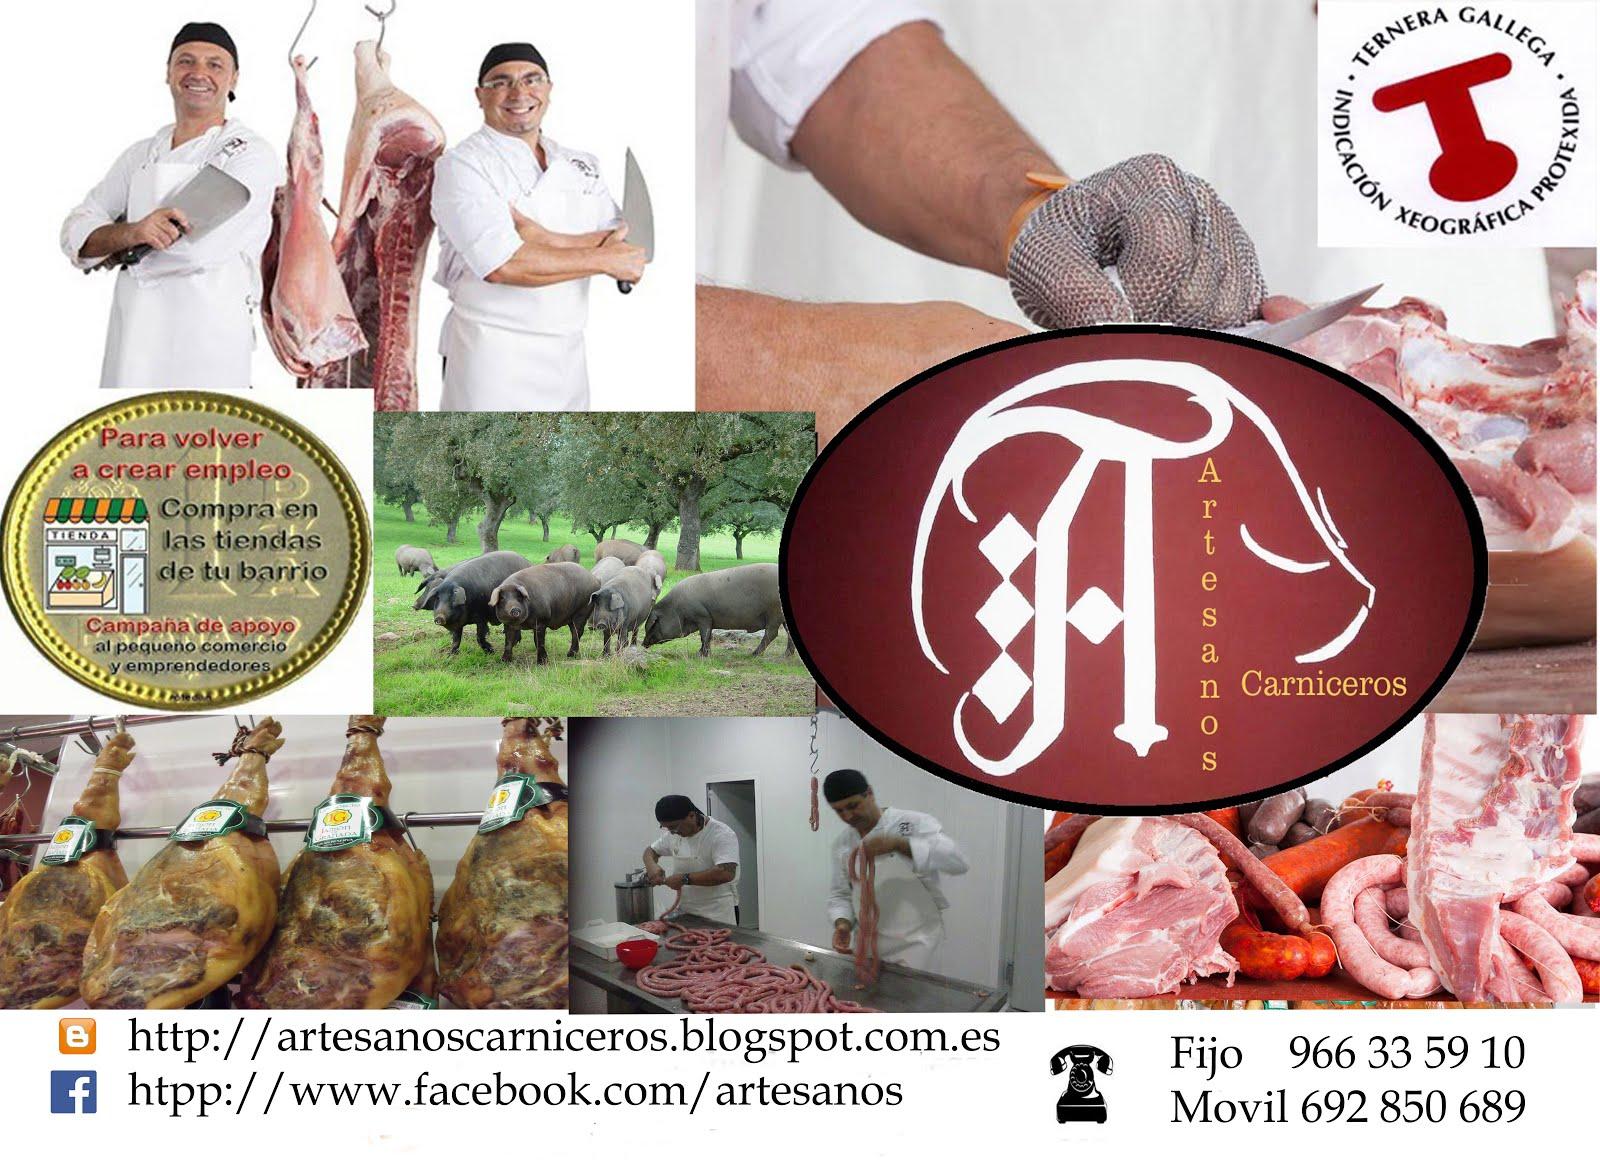 Artesanos Carniceros